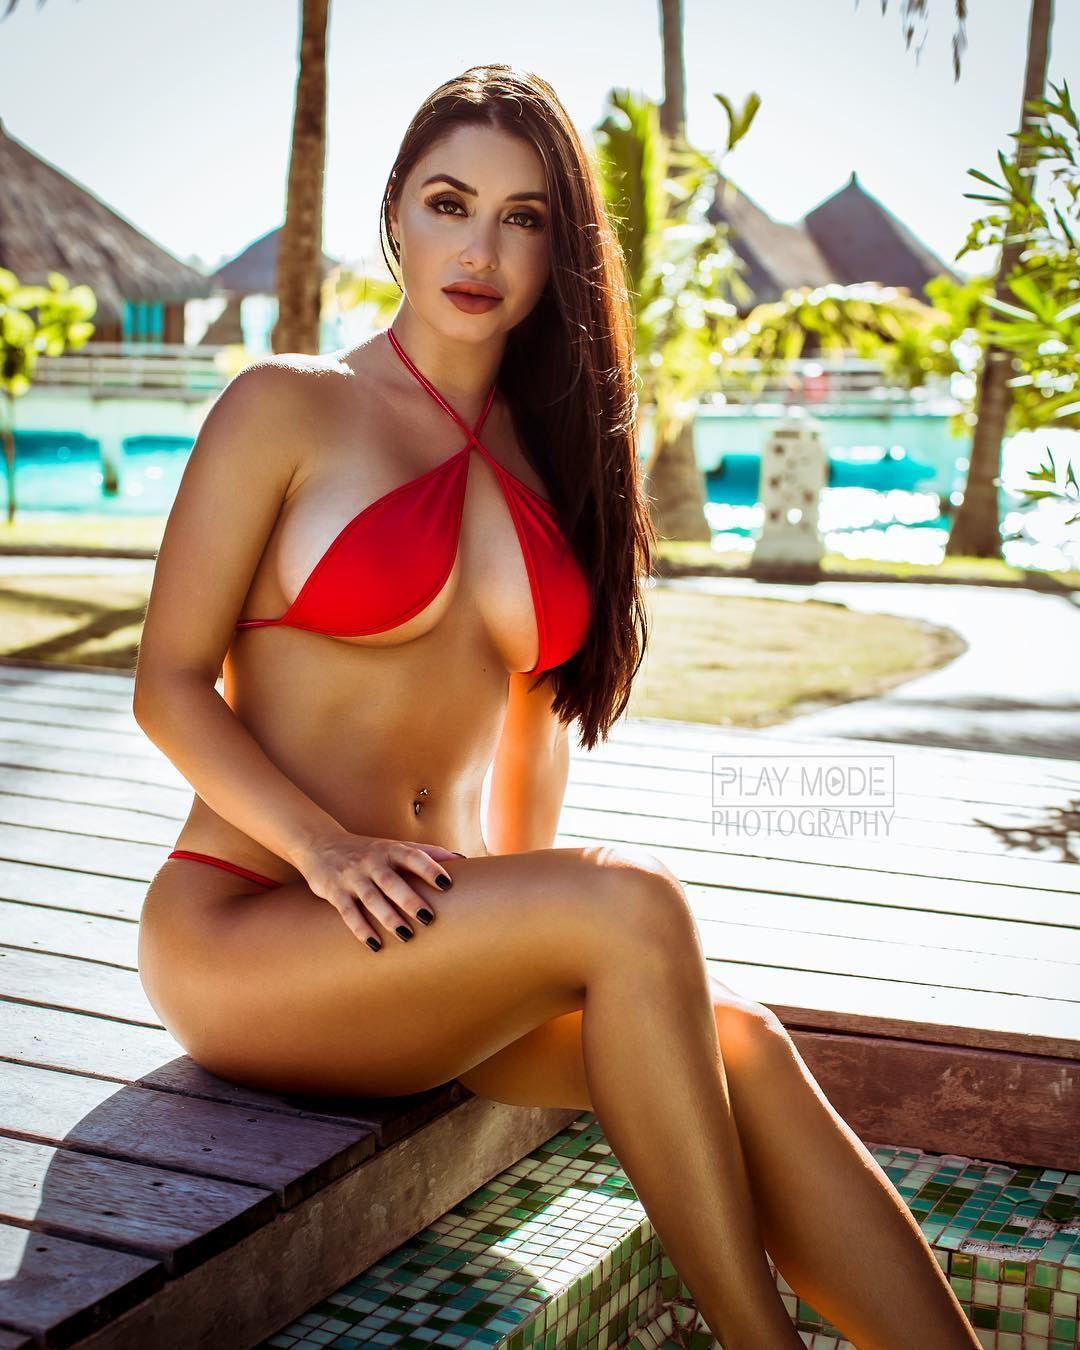 Bikini Laura Marie nude photos 2019